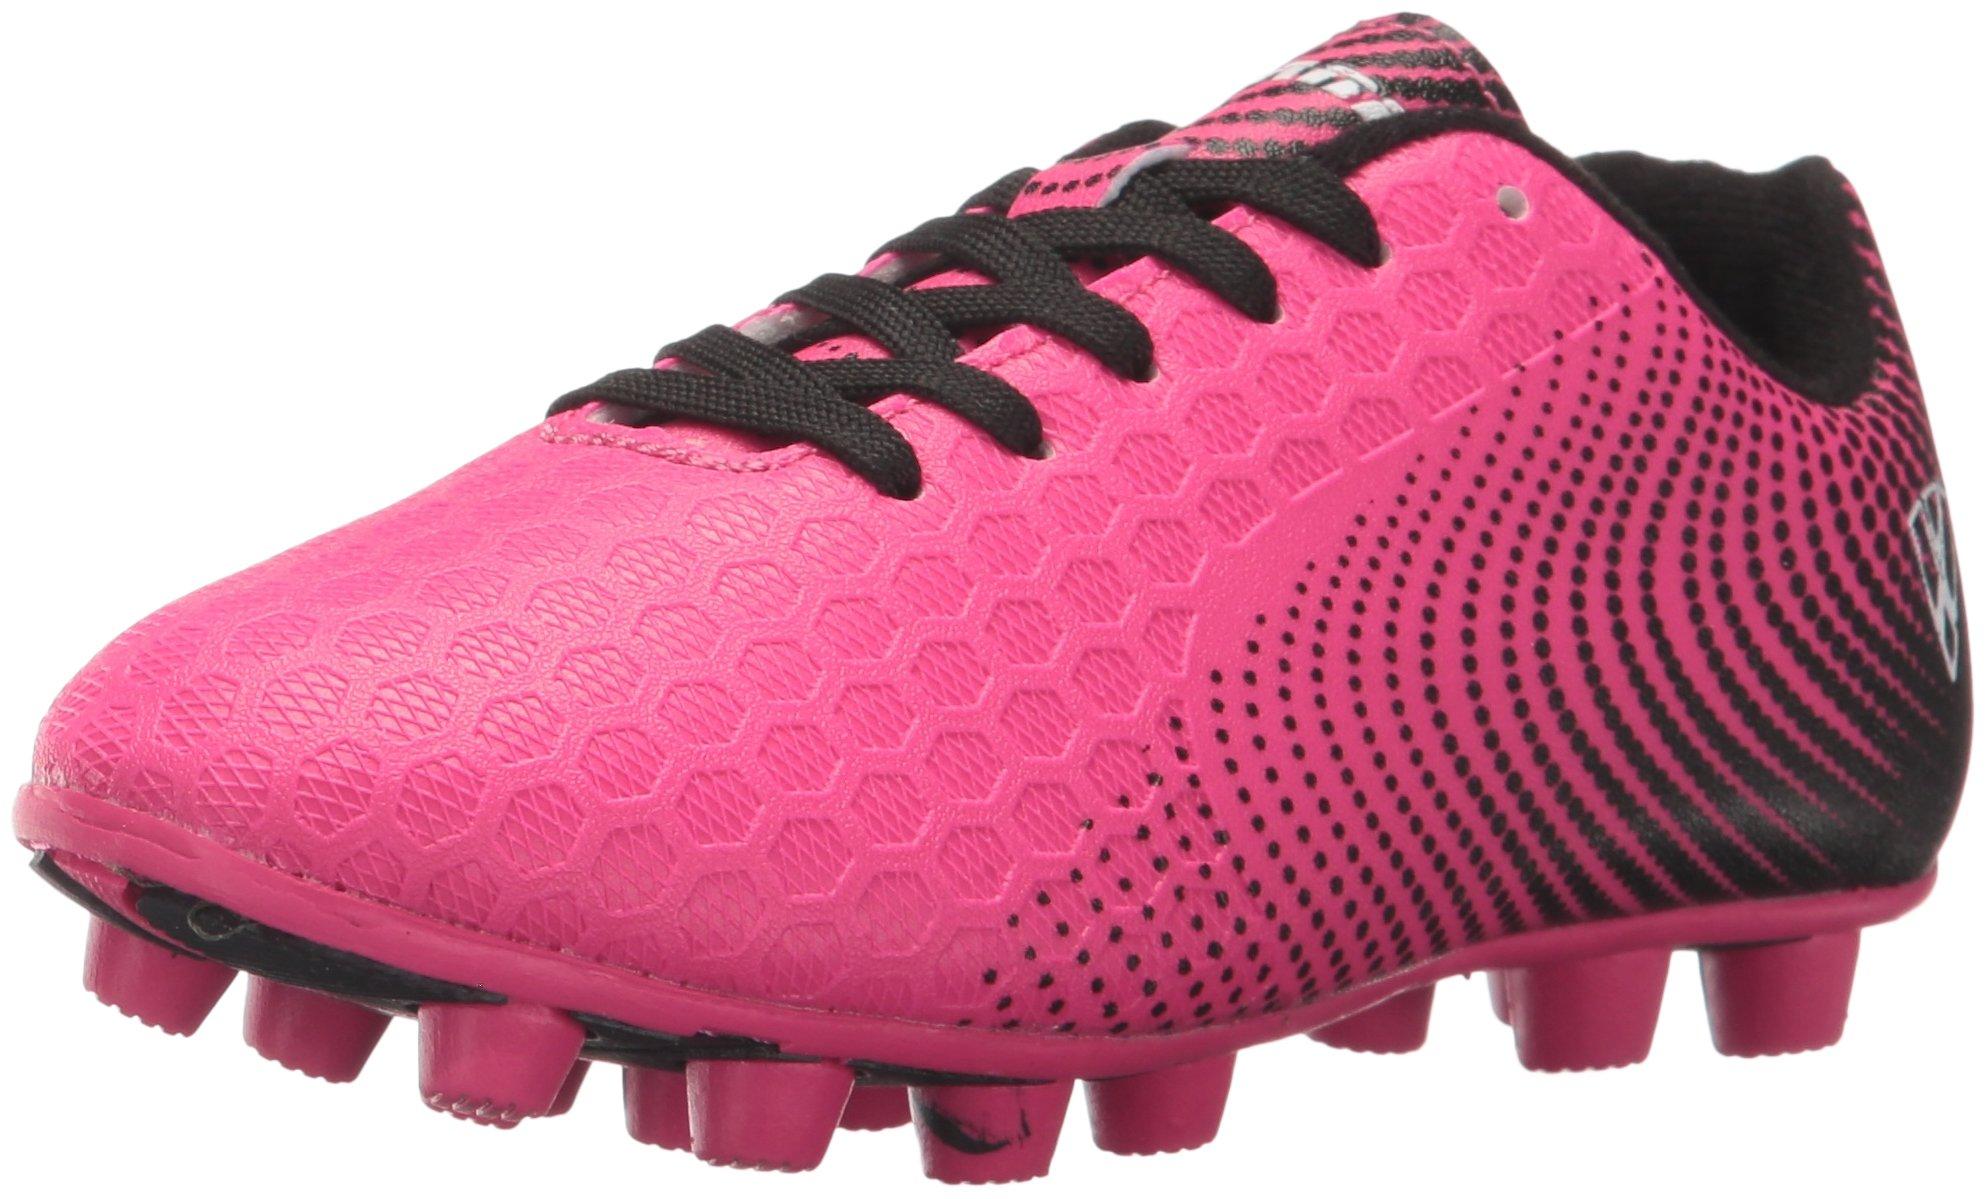 Vizari Unisex-Kids Stealth FG Size Soccer-Shoes, Pink/Black, 11 M US Little Kid